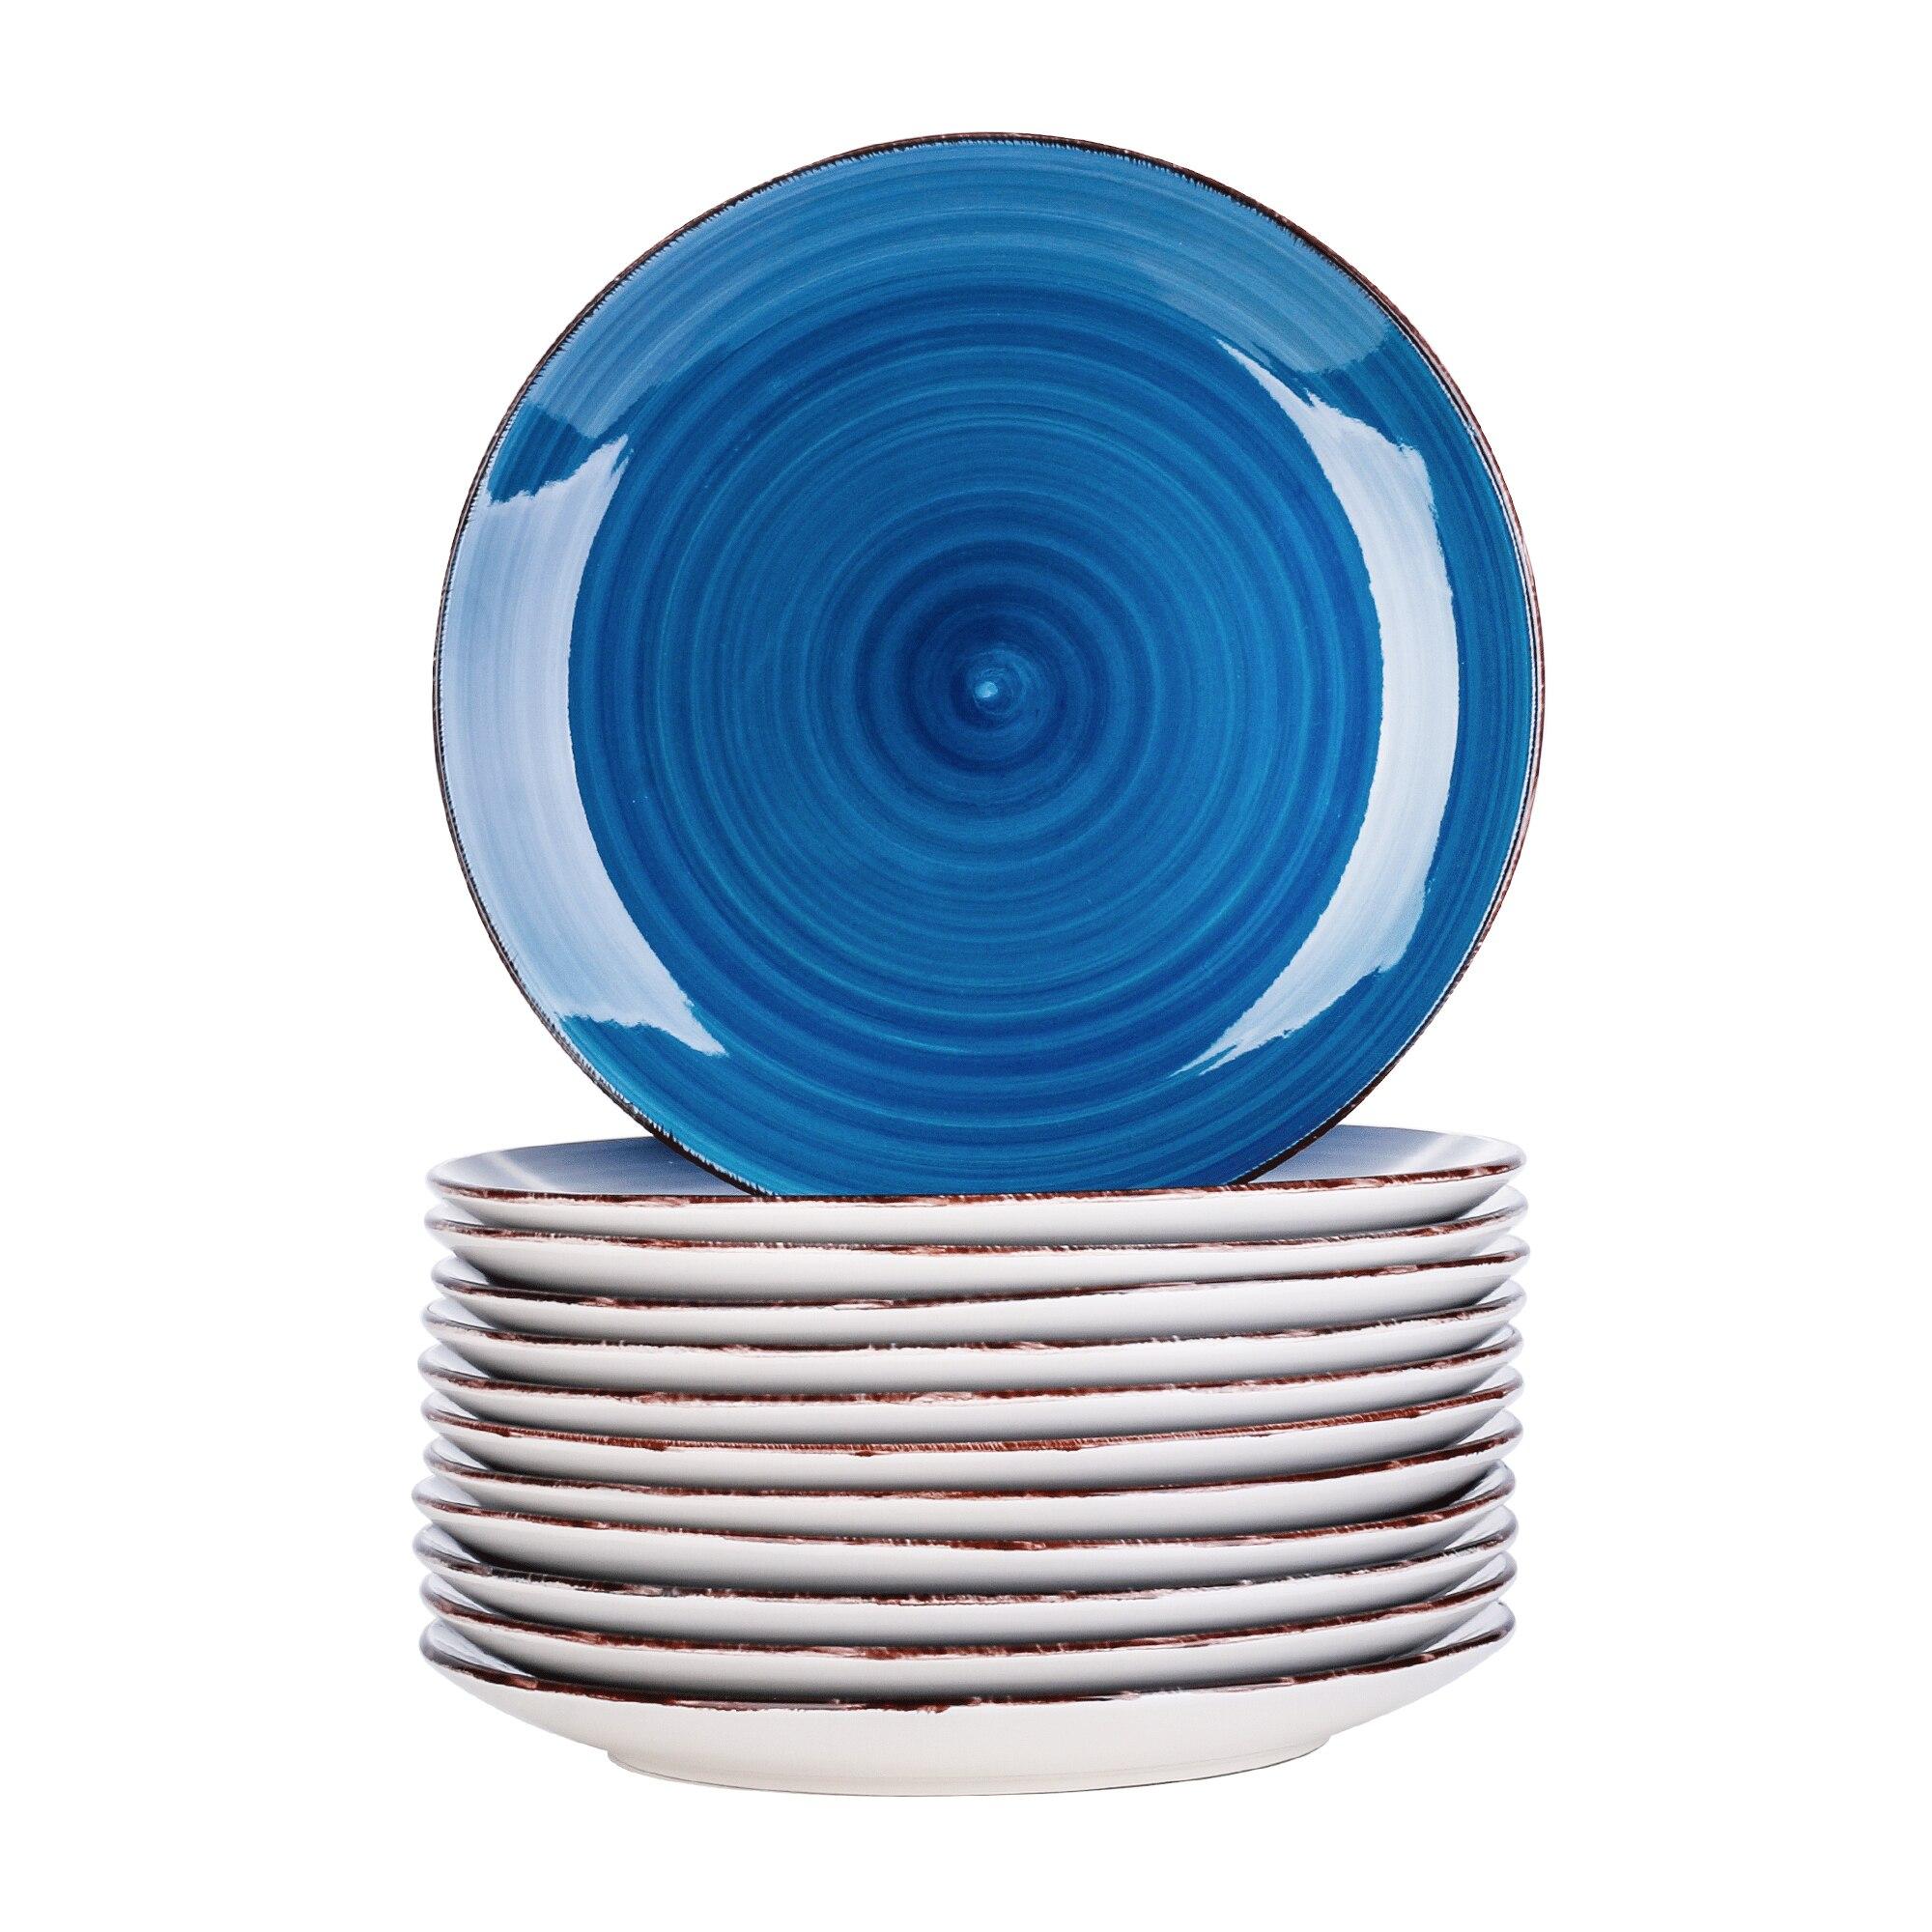 Vancasso Bella 4/8/12-pieces Porcelain Ceramic Handpainted Dinner Plate Set Dinner/Salad/Fruit/Snack Plate Set(27* 27 * 2.8cm)